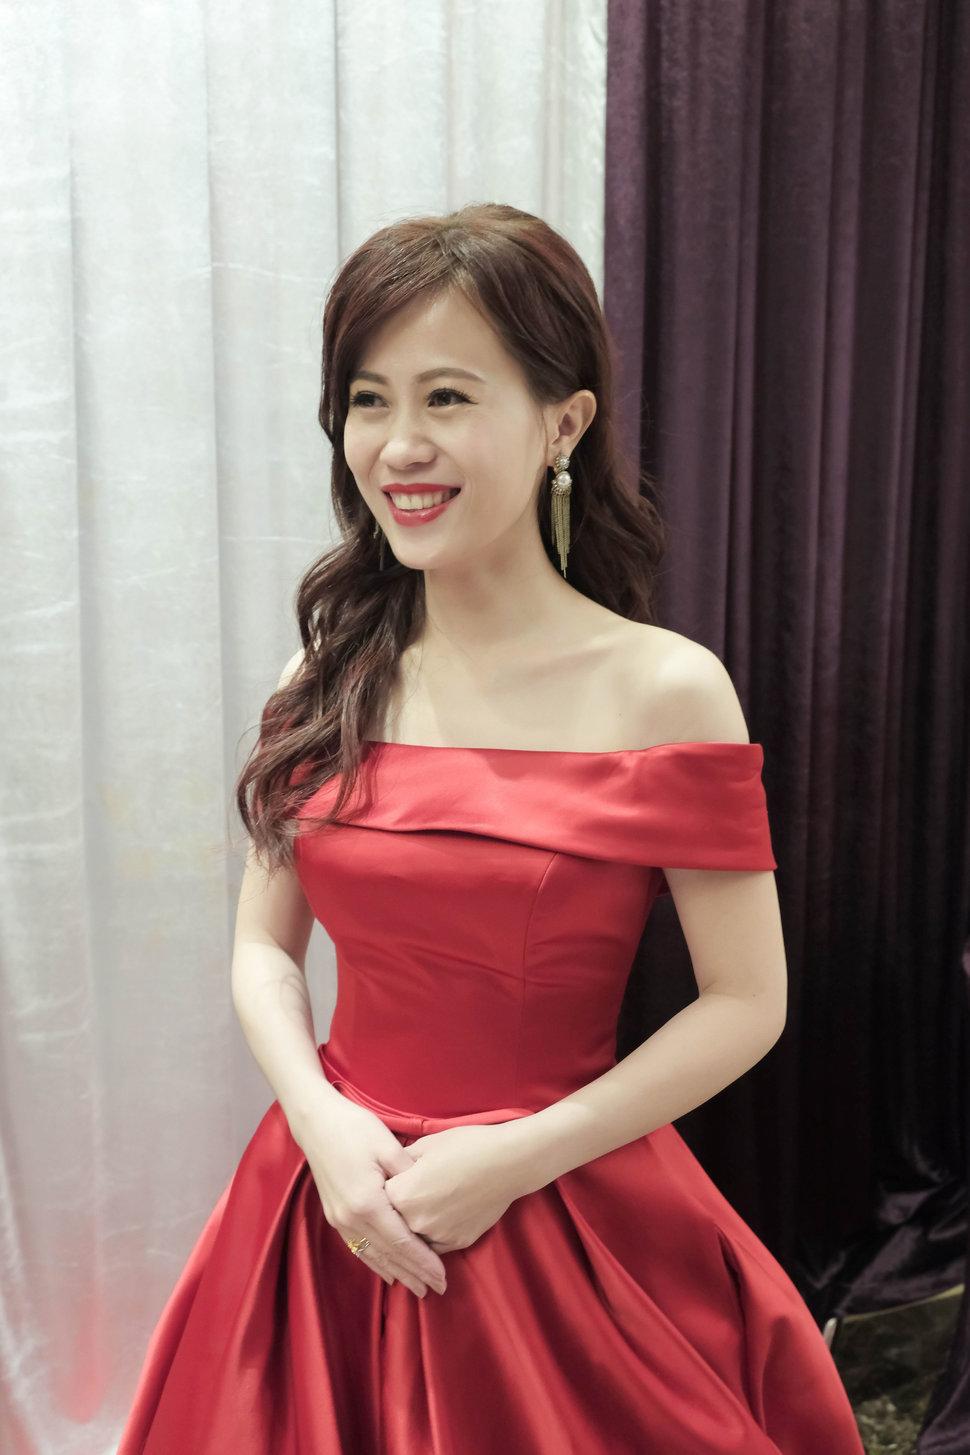 DSCF8465 - 新娘秘書 Yumi陳竹竹 造型工作室 - 結婚吧